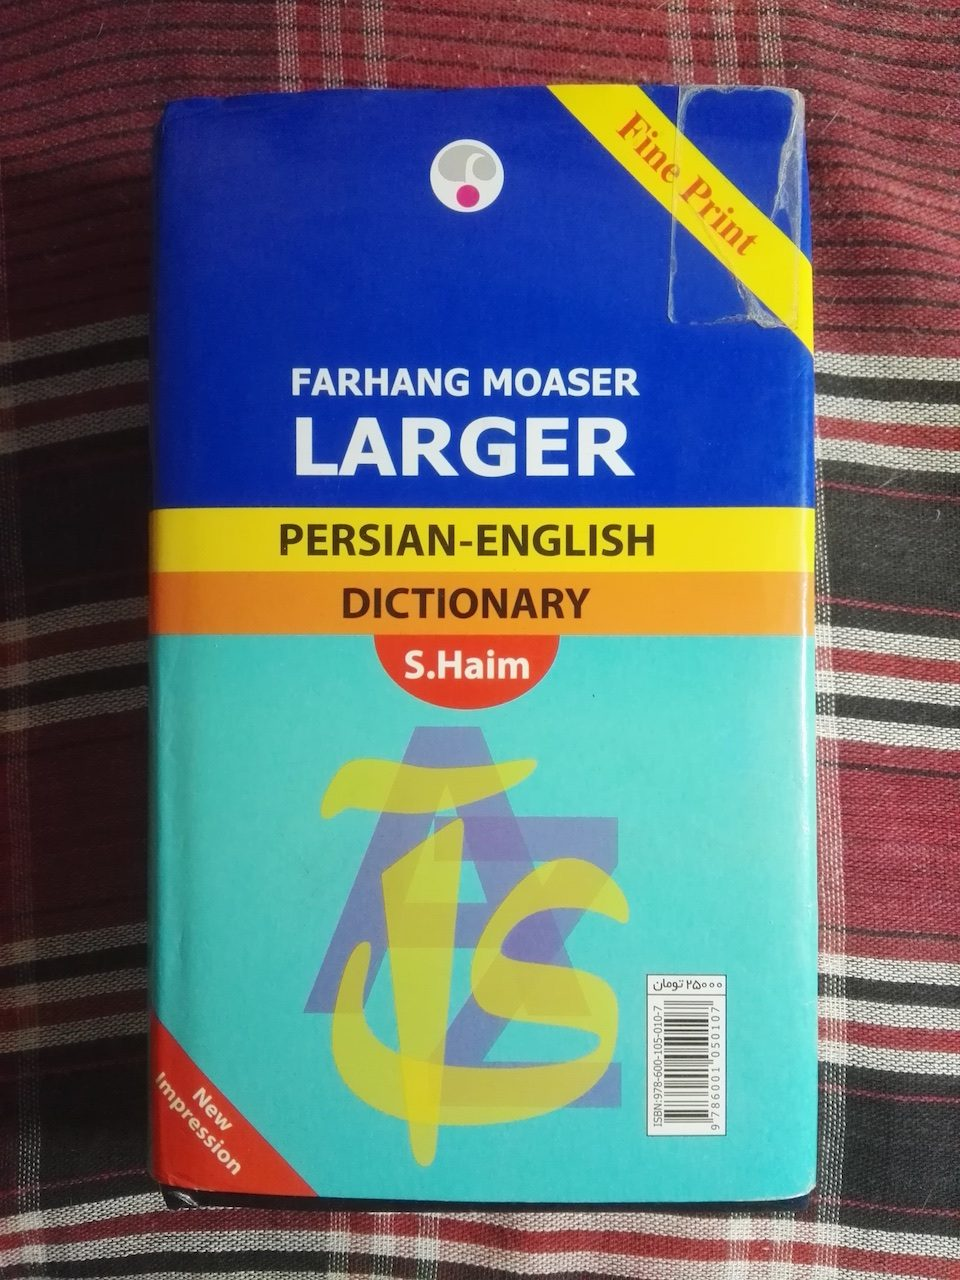 Farhang Moaser Haim Larger Dictionary